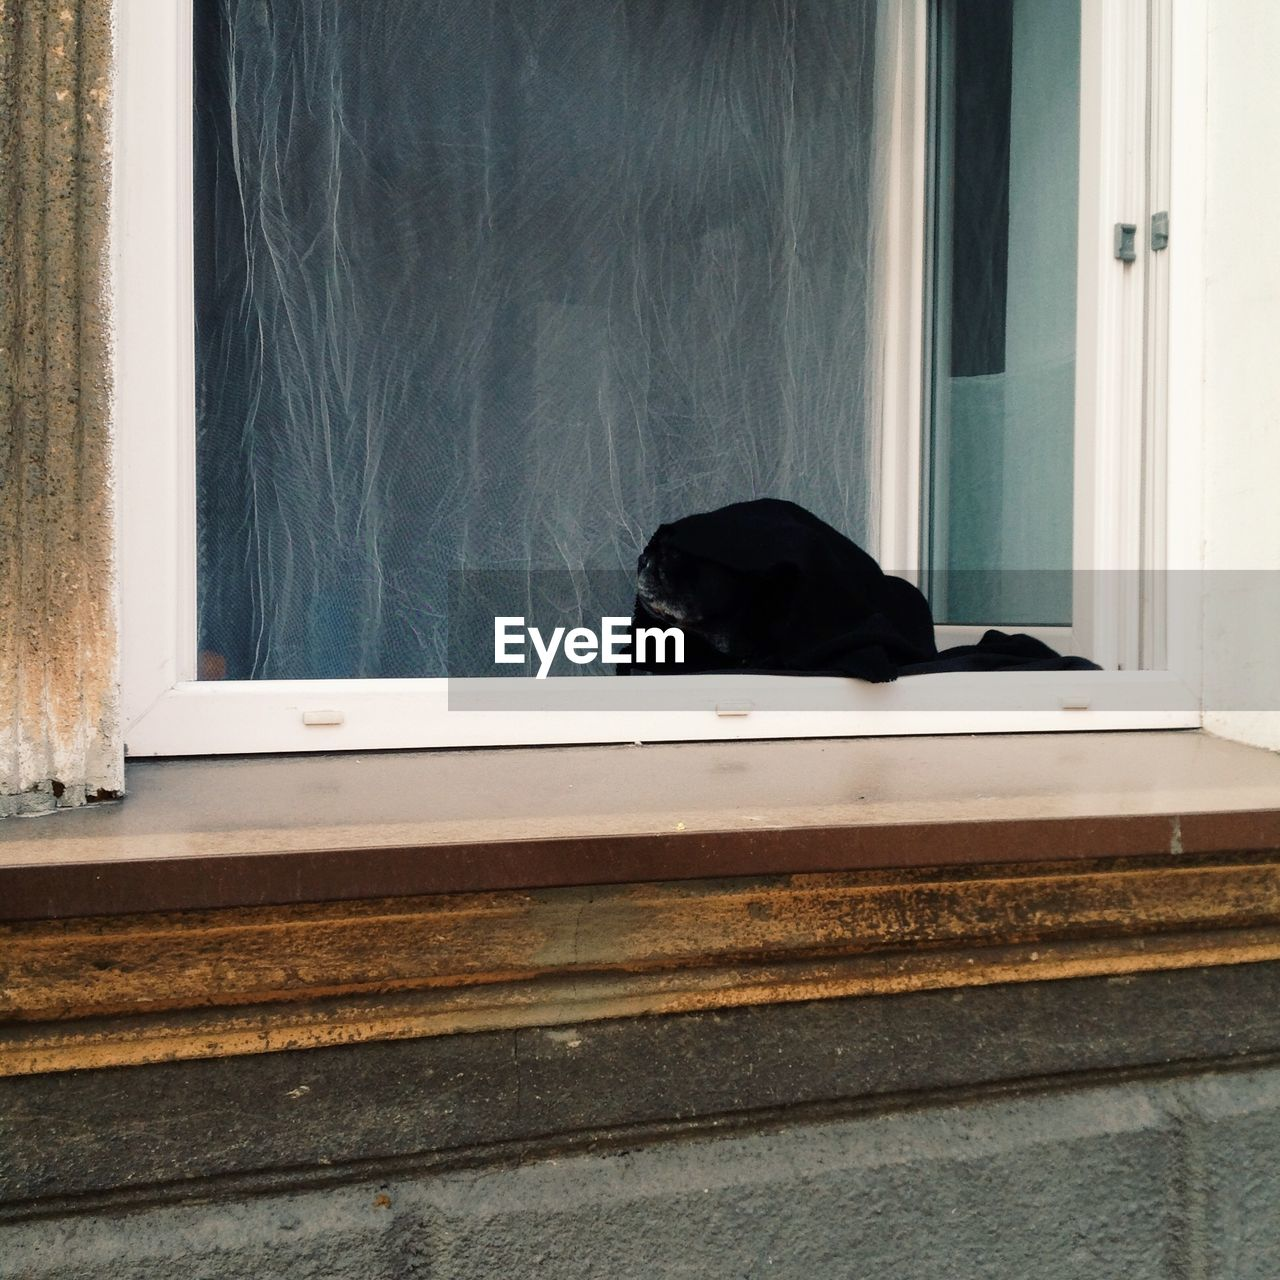 BLACK DOG LOOKING THROUGH WINDOW